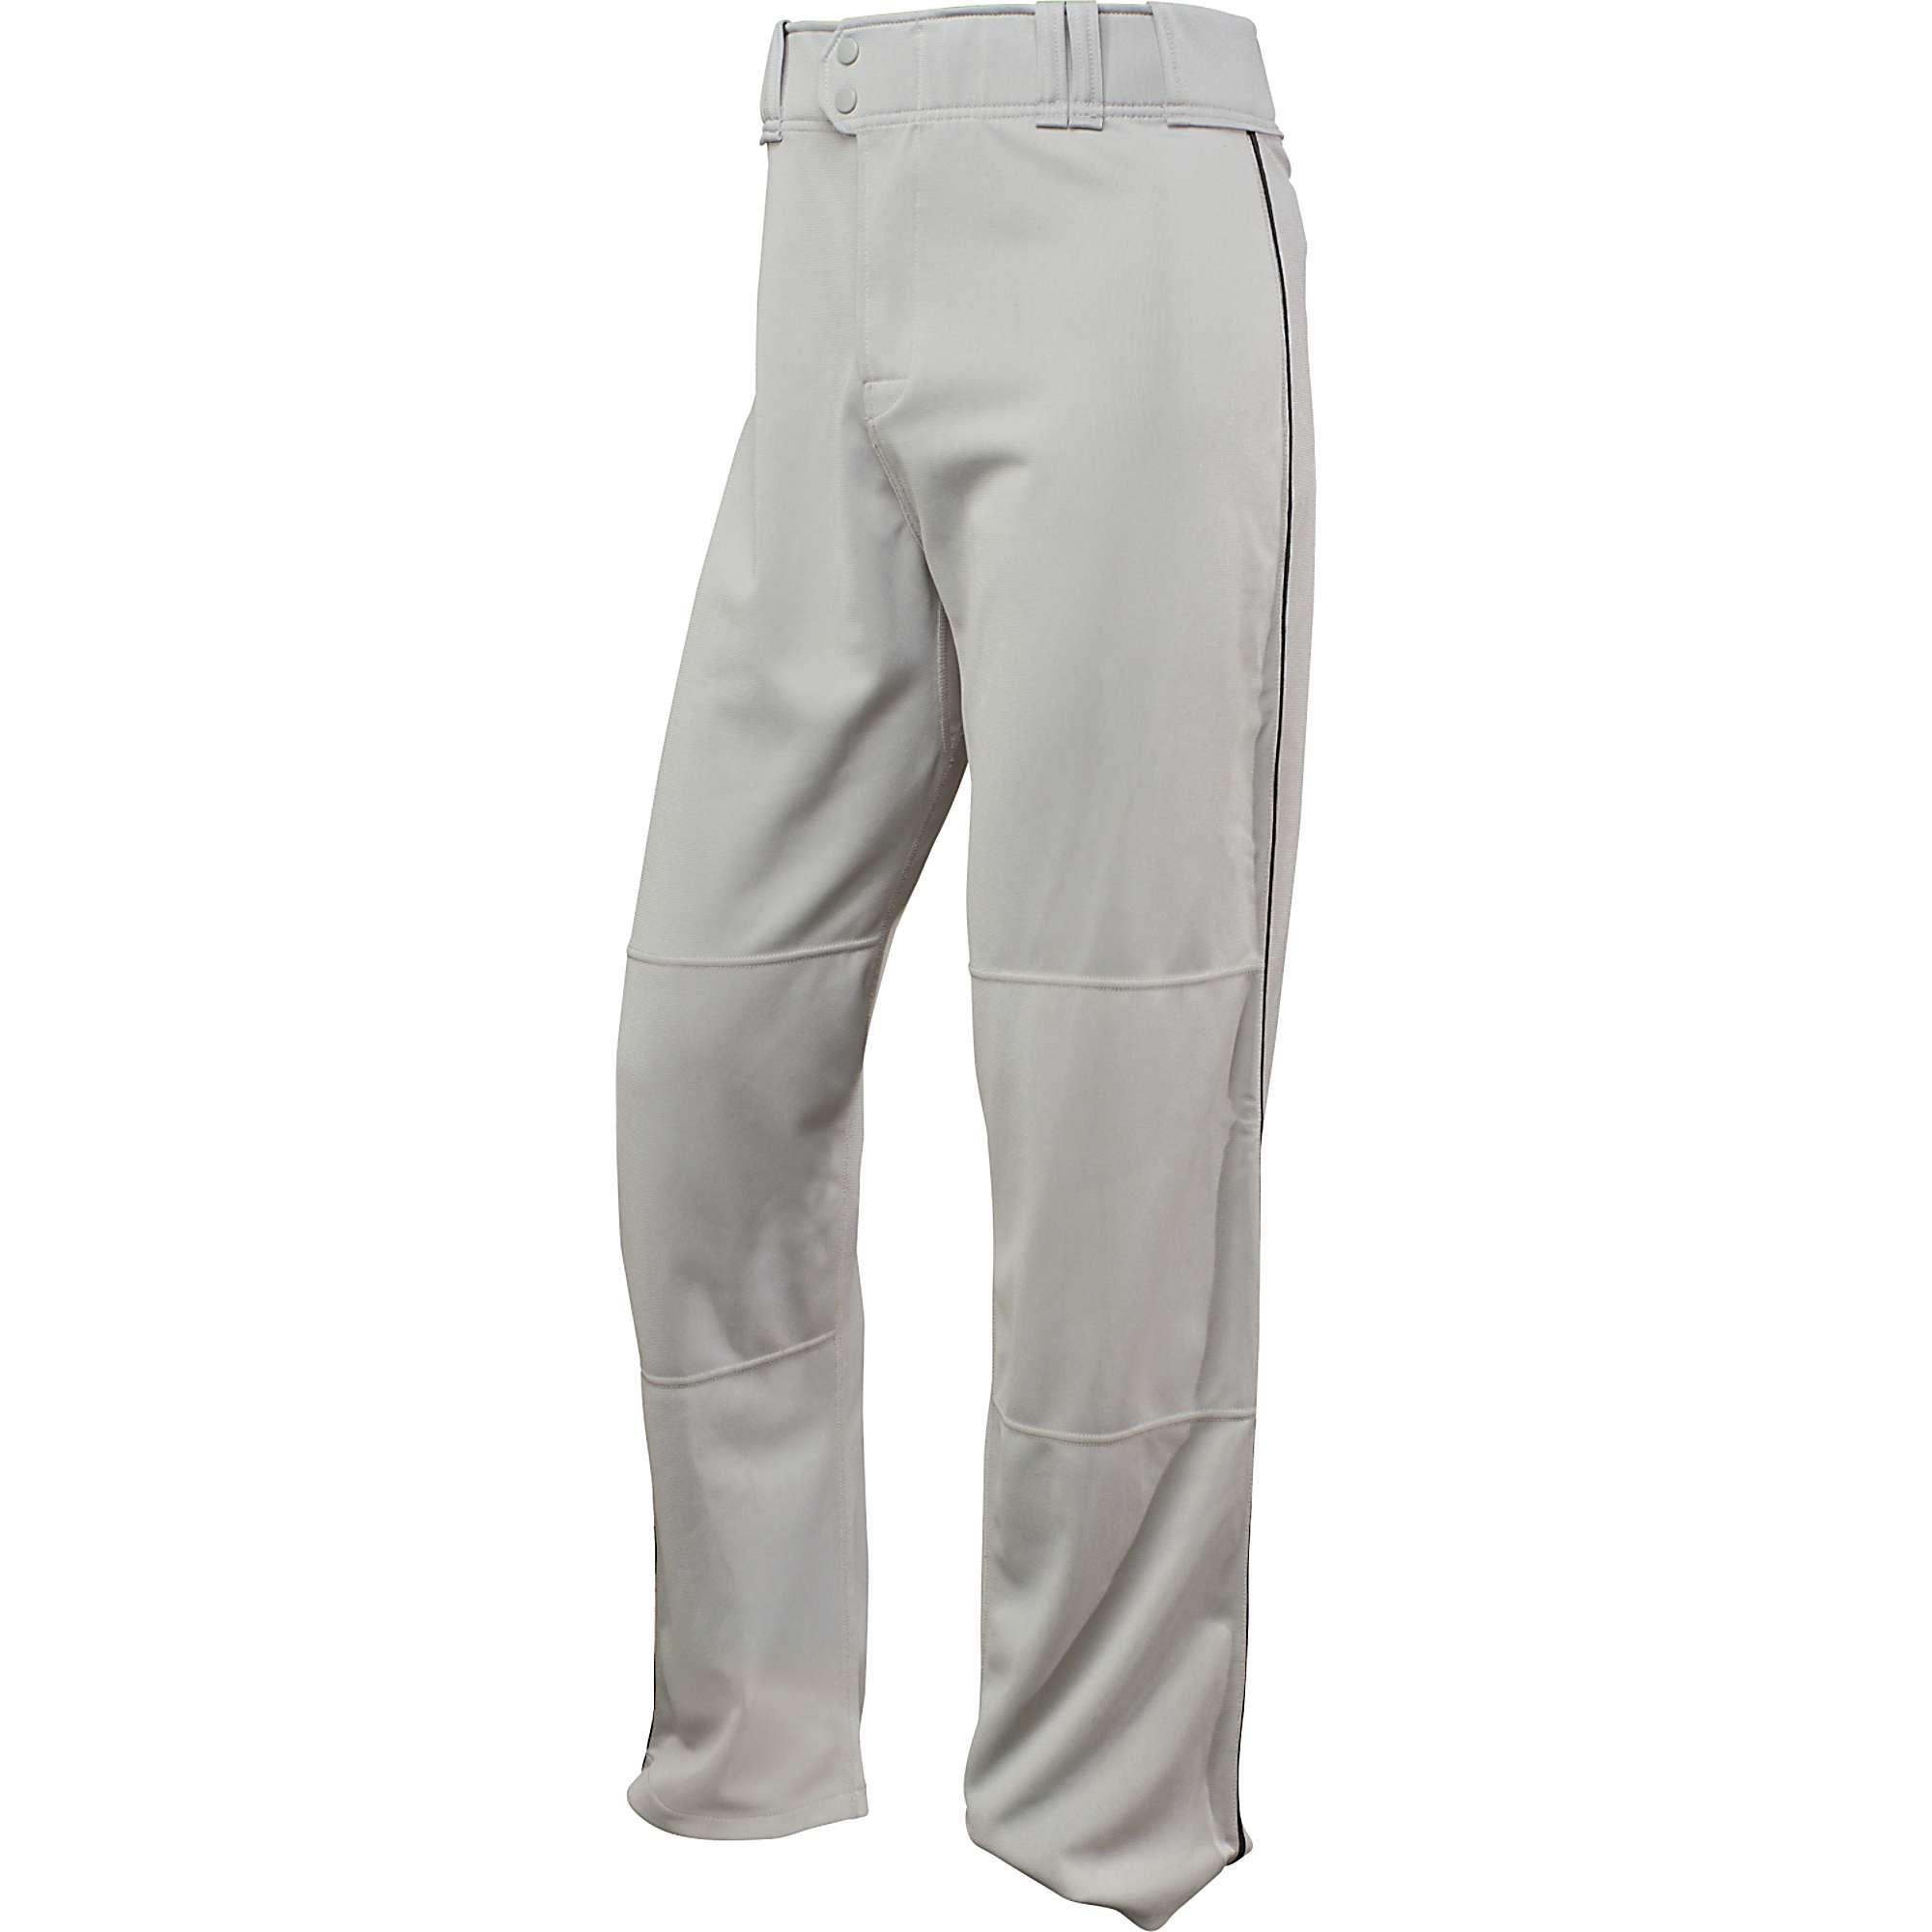 Rawlings Adult Pro Flare Baseball Pants 105